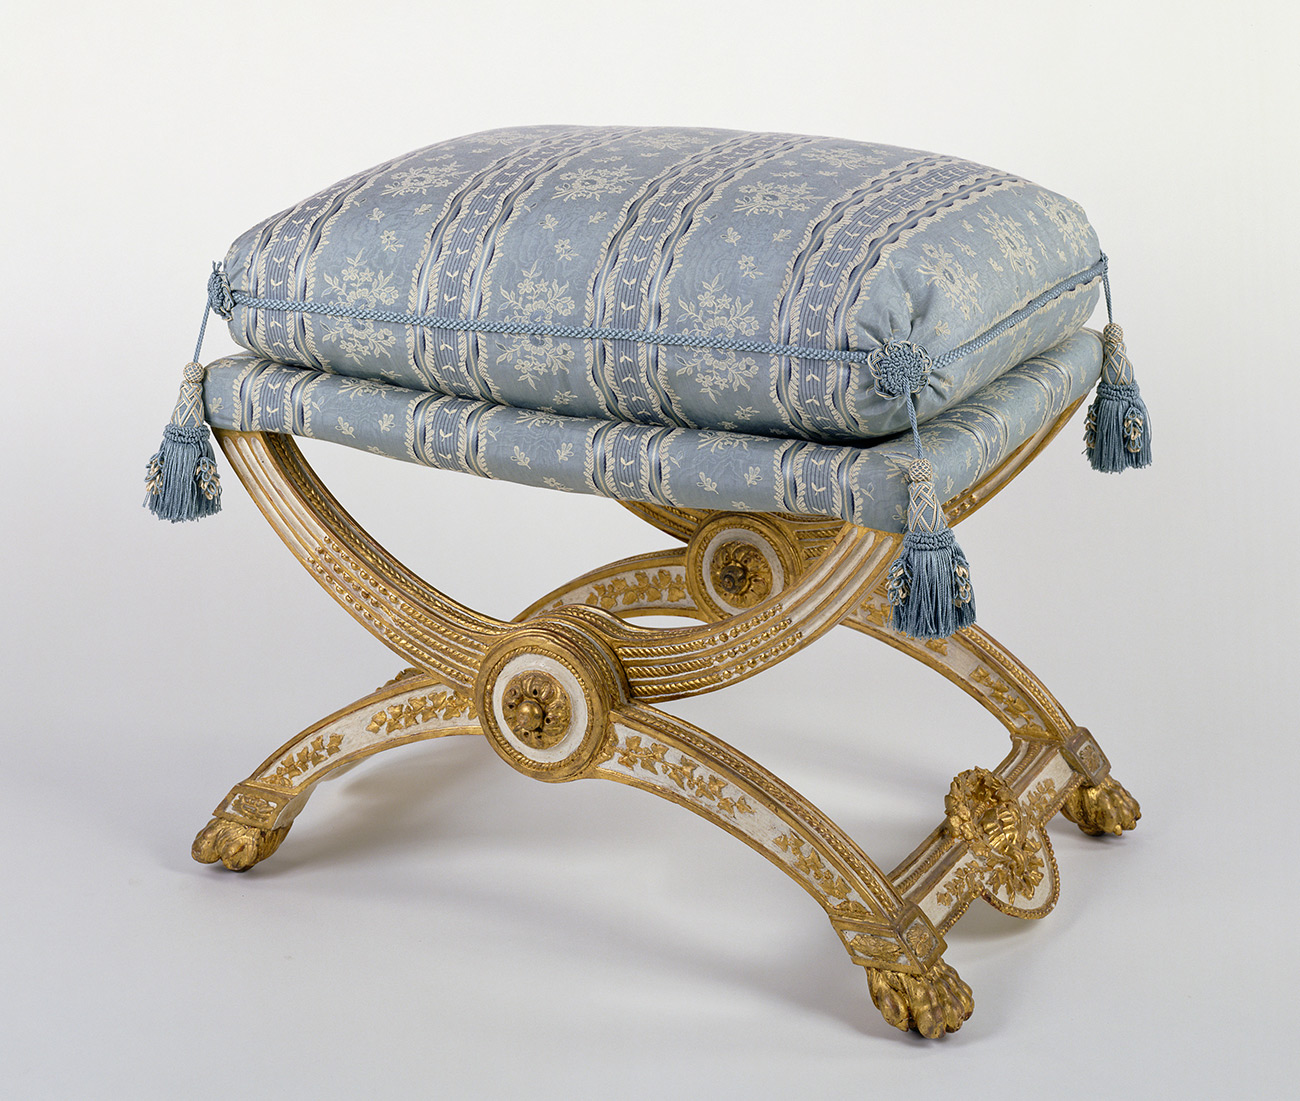 Antique folding stool with light blue cushion